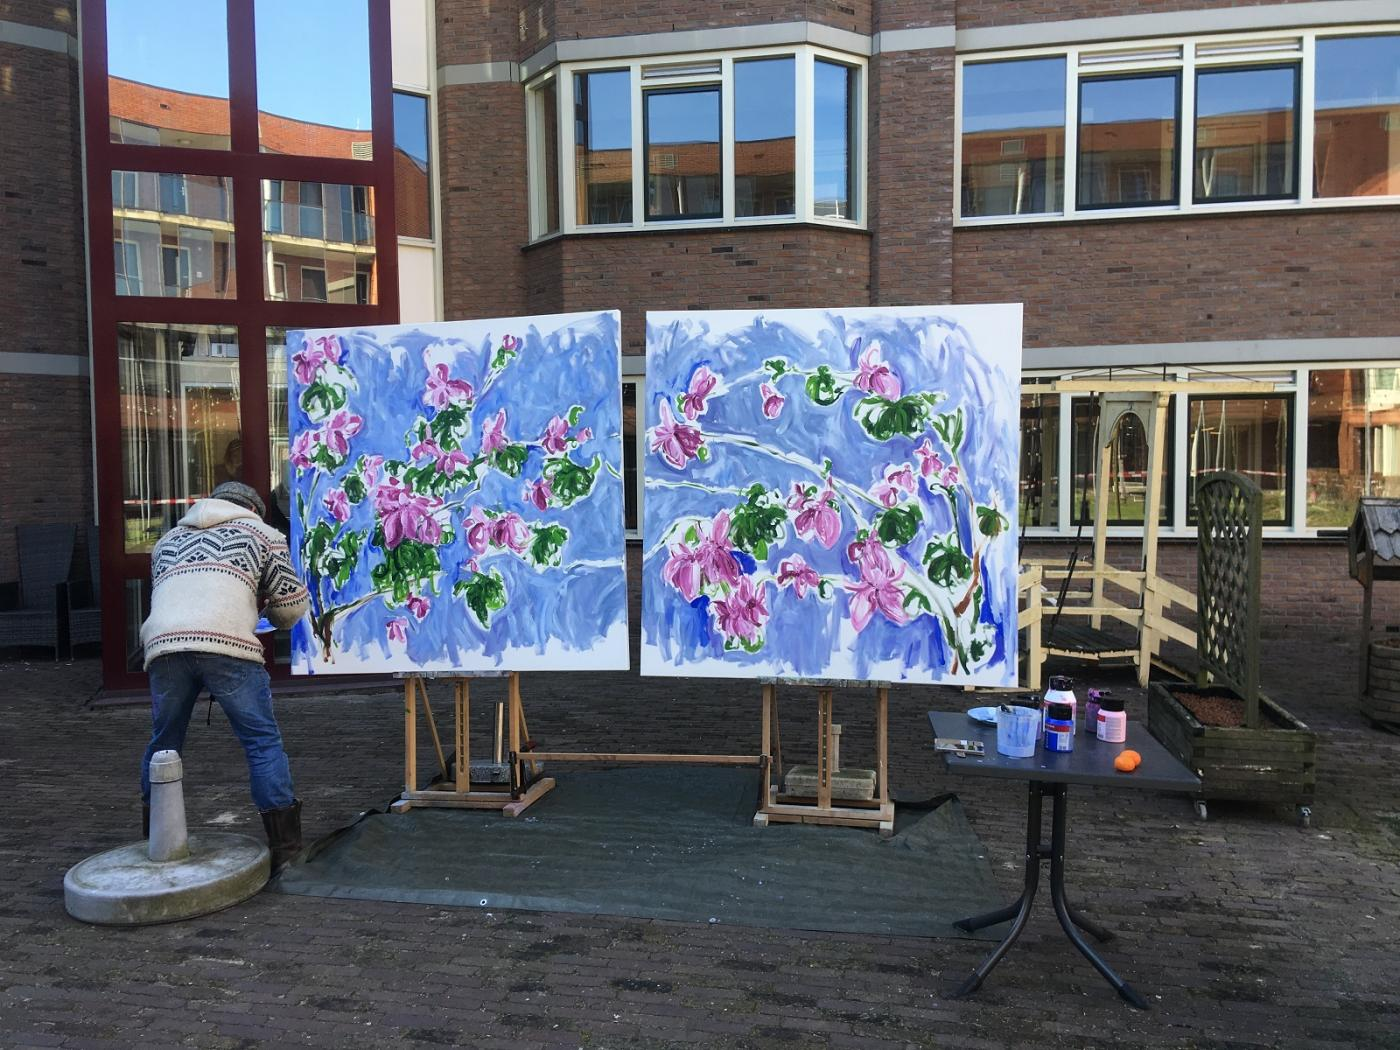 Kunstschilder Rob Cemeus schilder lentebloemen op afstand